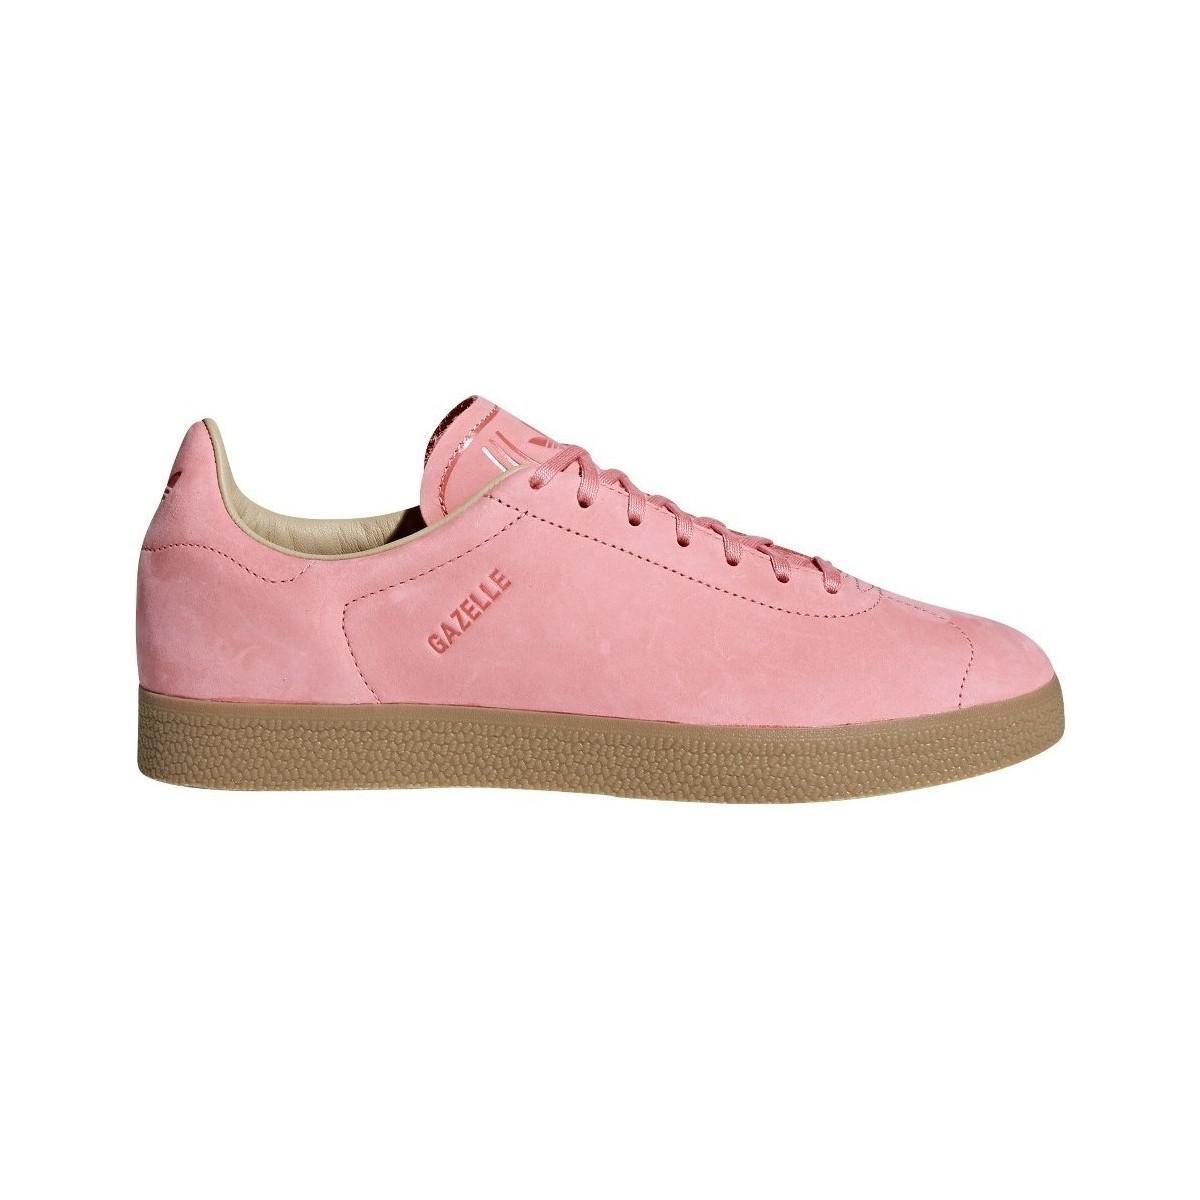 Adidas Originals Gazelle Decon Sneakers In Pink CG3706 Pink